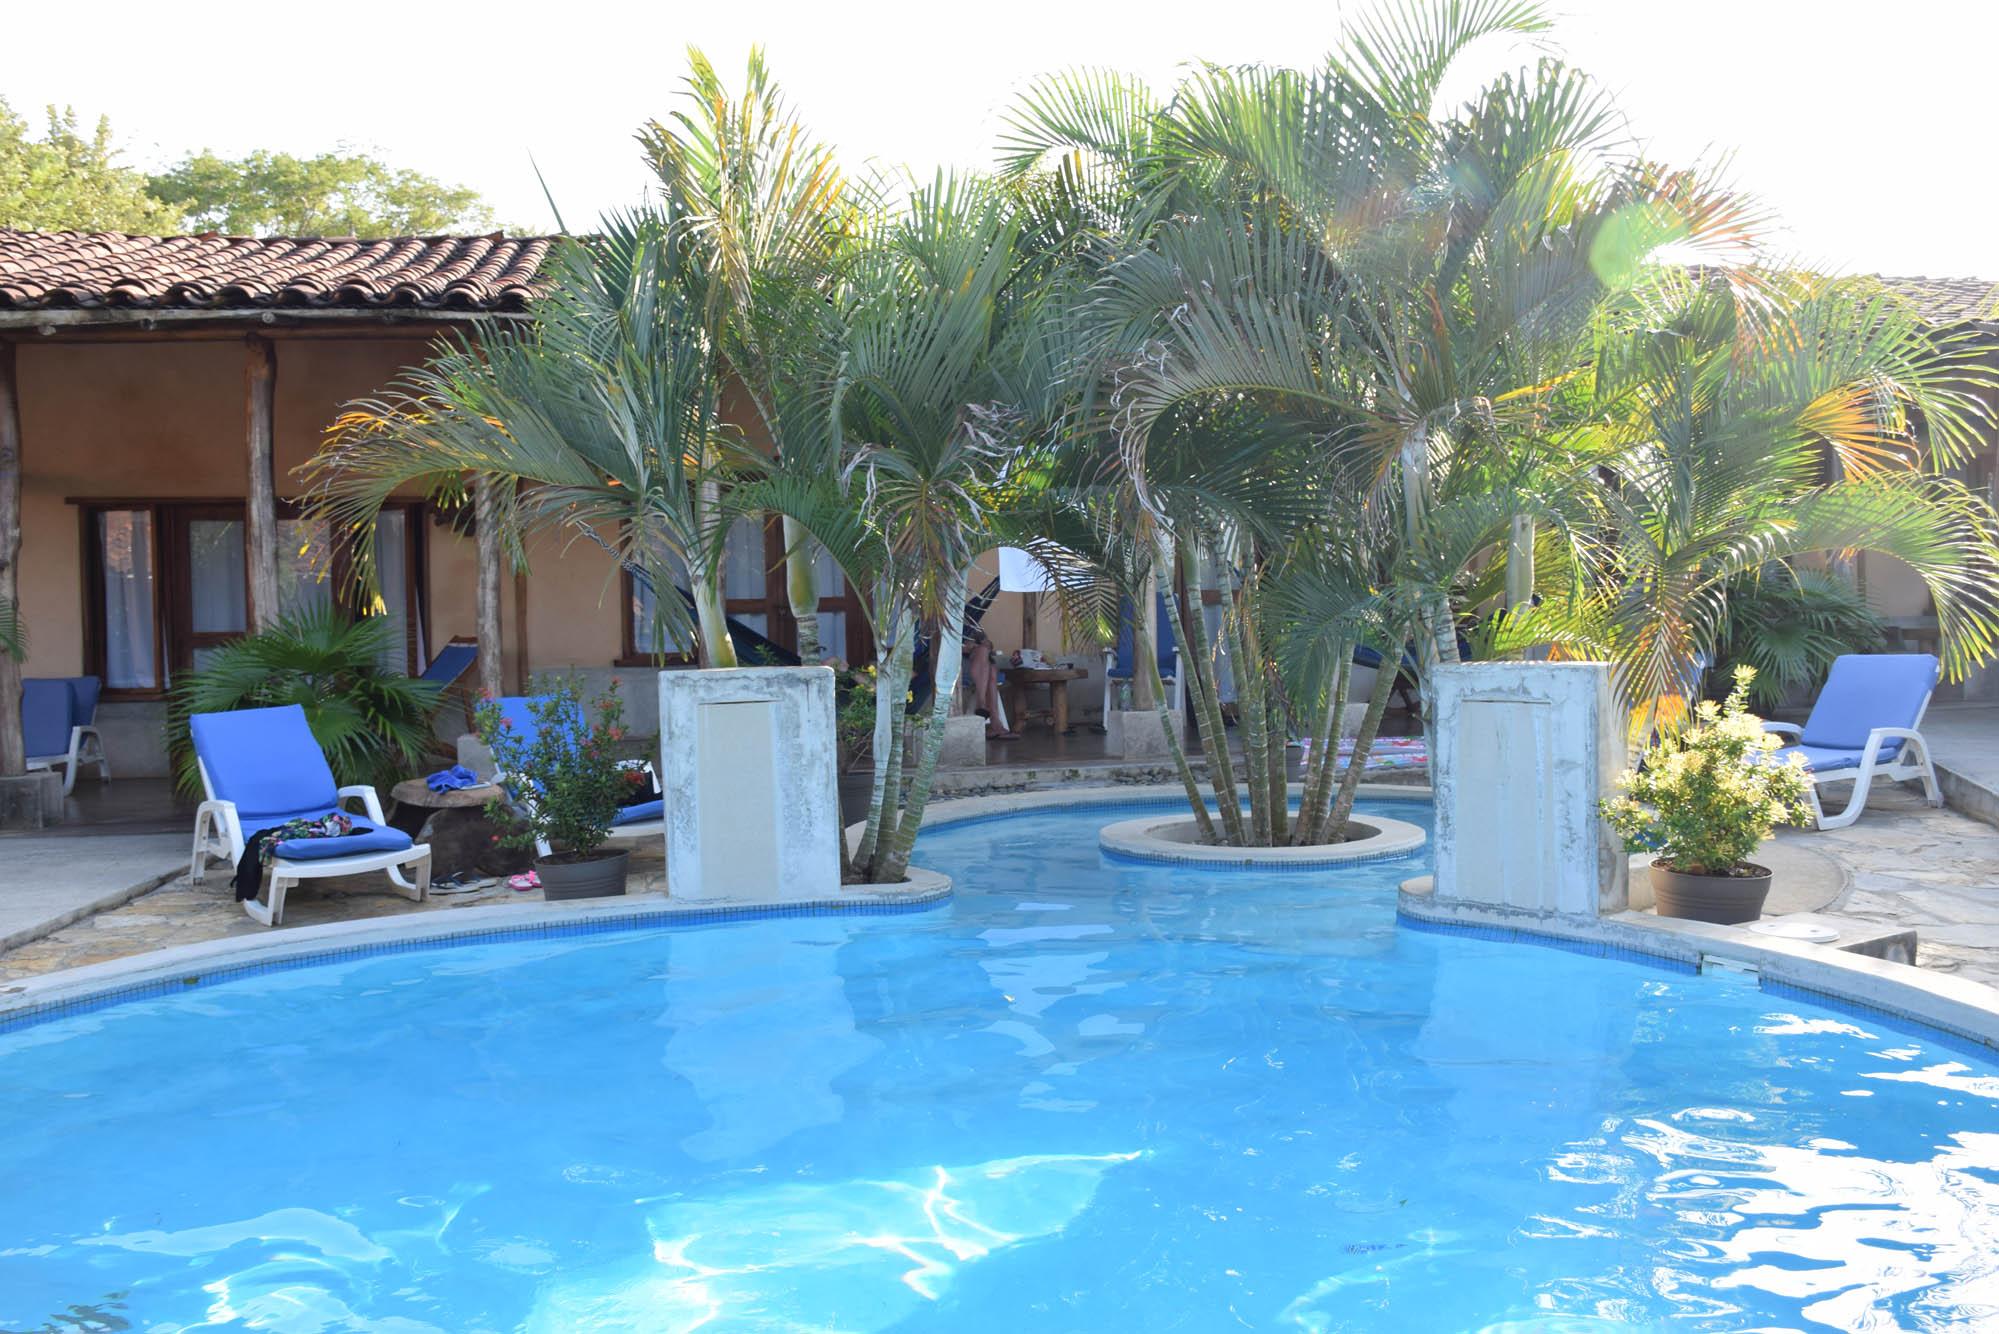 Pedasi-Isla-Iguana-Panama-Andromeda-Playa-Venao-LalaRebelo_0050